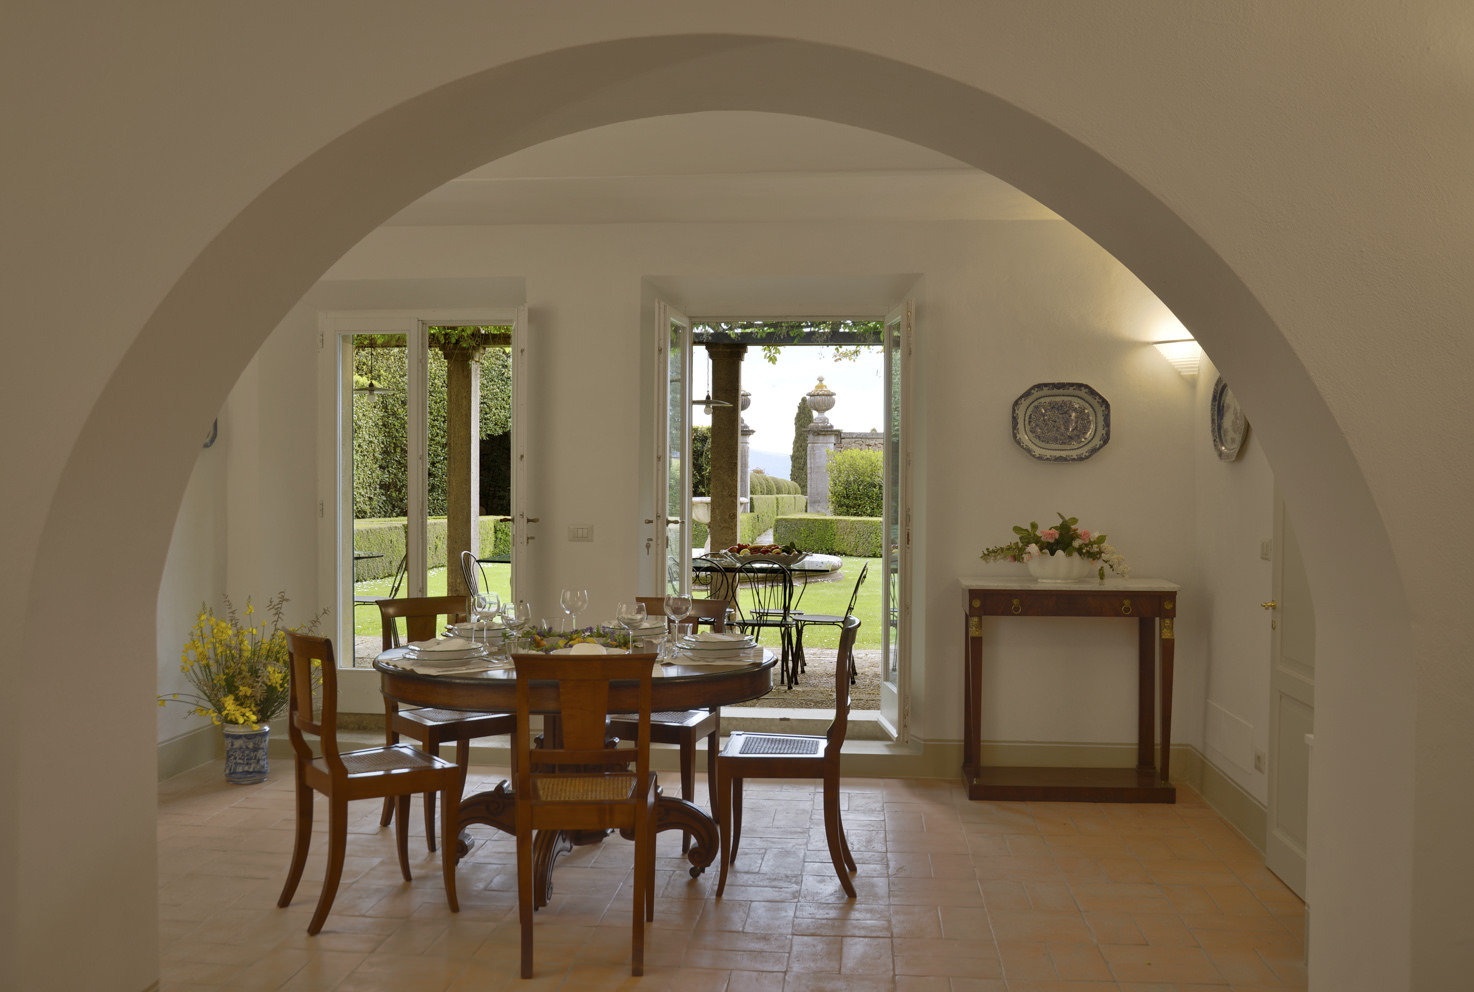 Interior of Villa La Foce